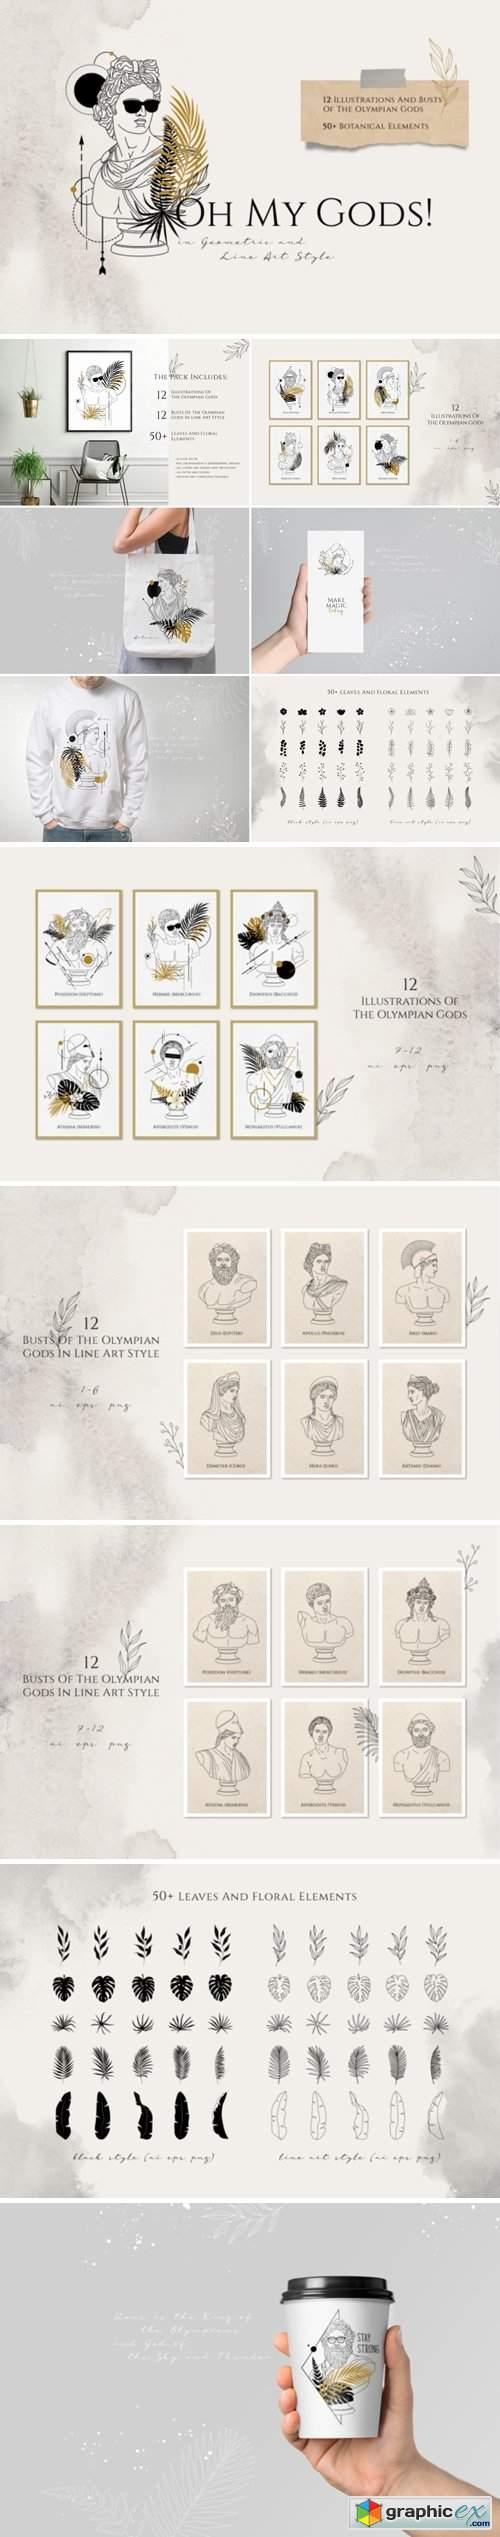 Oh My Gods! Olympian Gods in Line Art